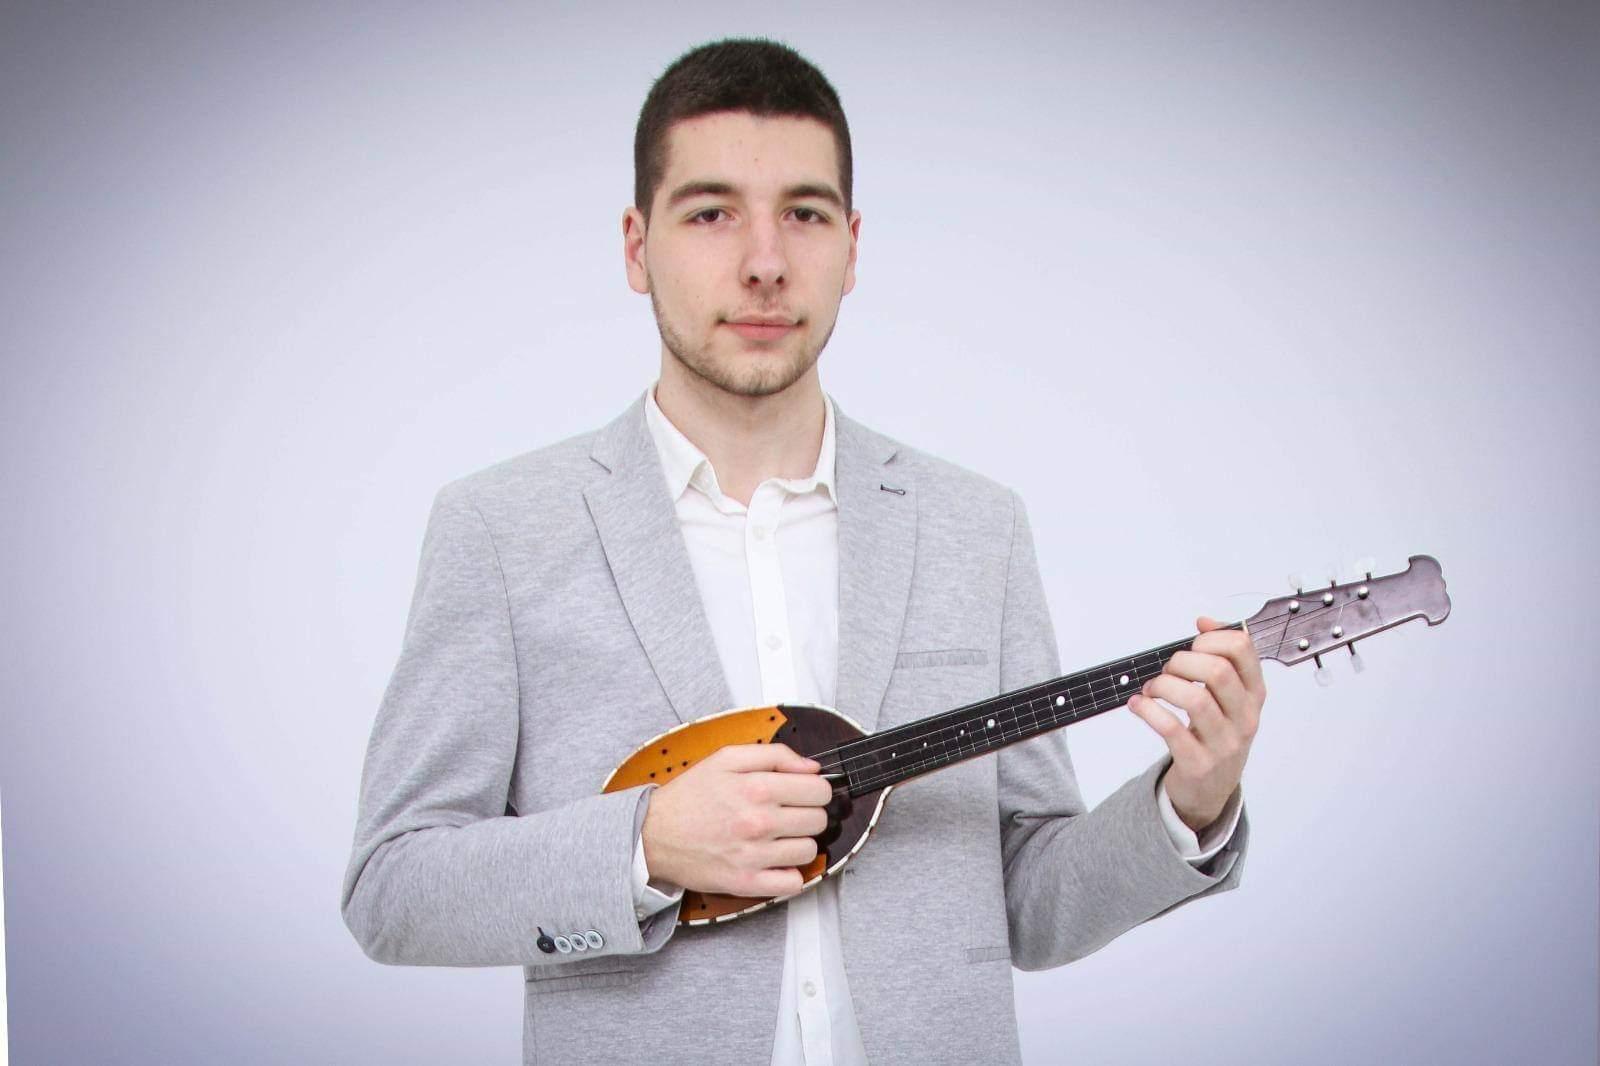 Damir Pranjković din Alibunar, tânăr muzician cu visuri împlinite